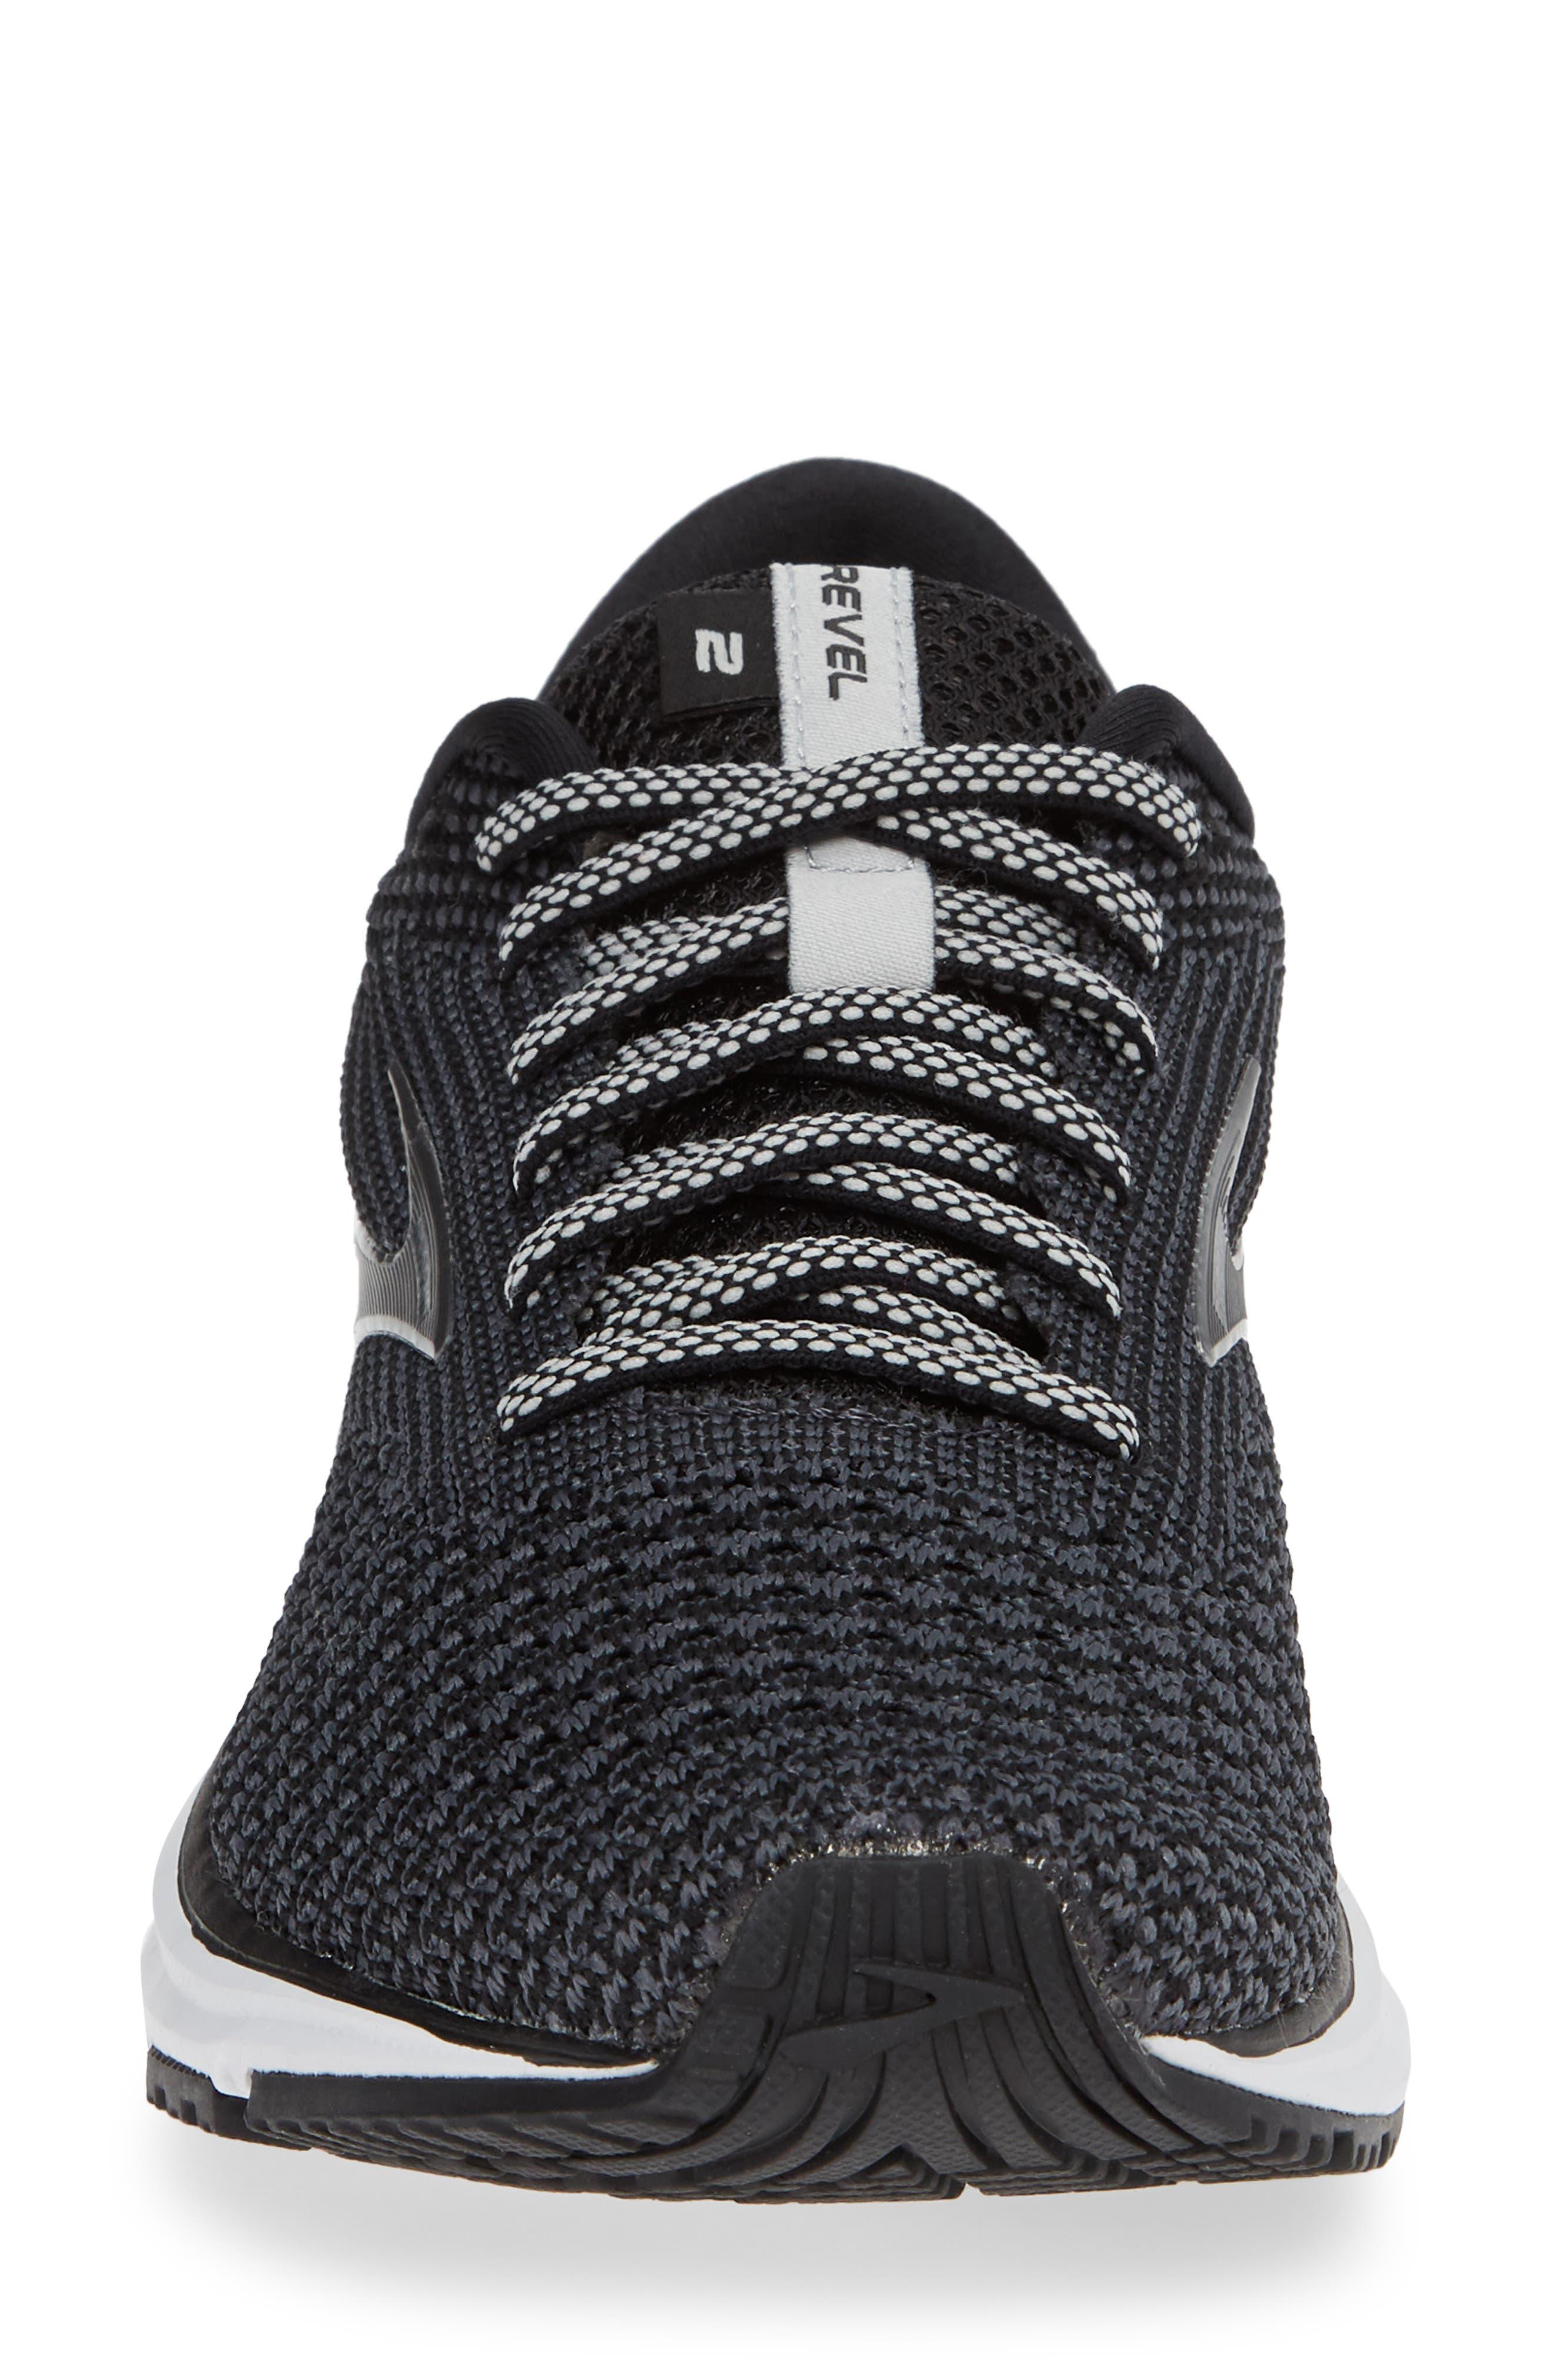 Revel 2 Running Shoe,                             Alternate thumbnail 4, color,                             BLACK/ GREY/ GREY